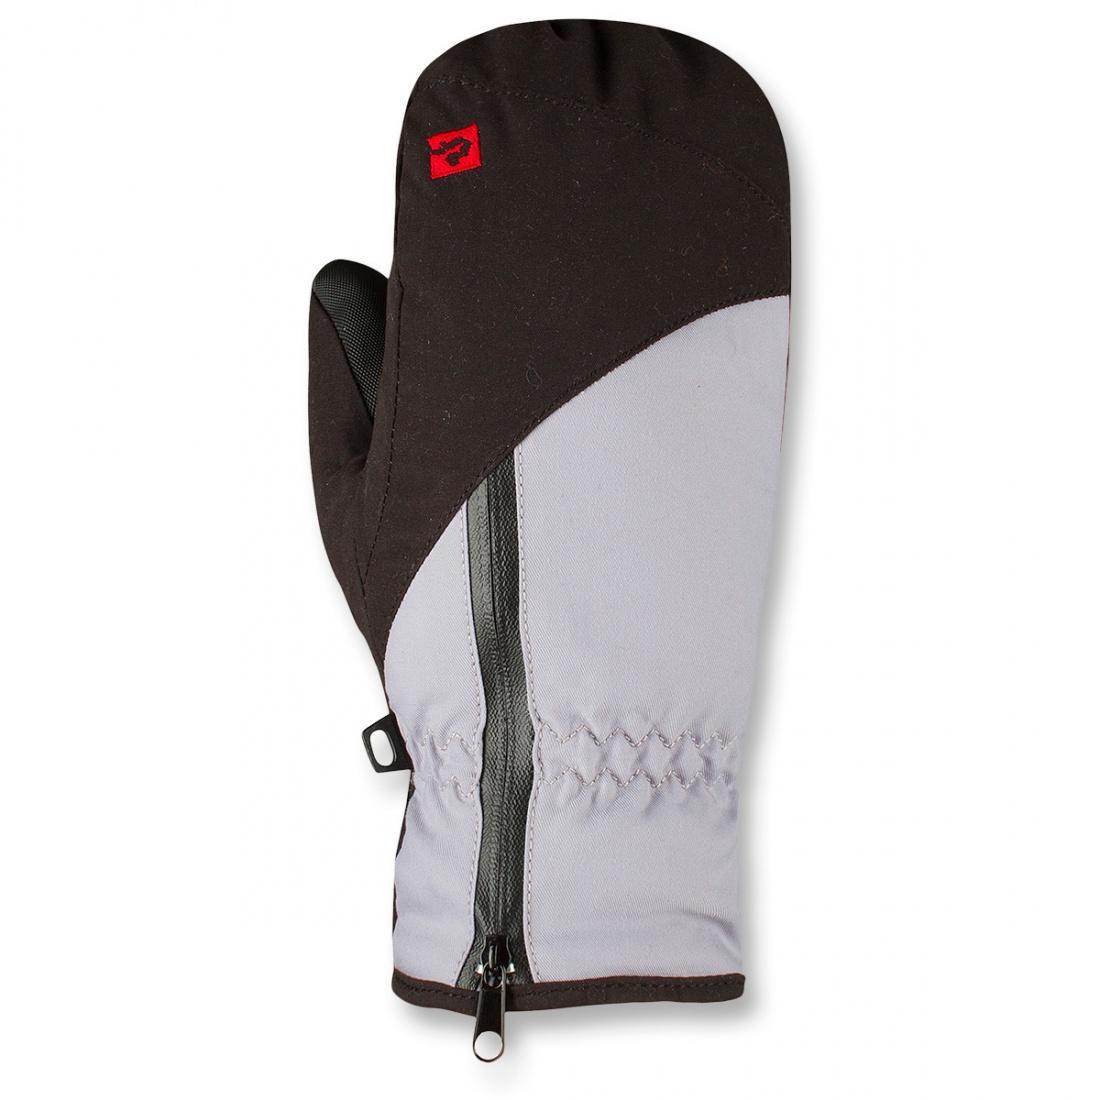 Рукавицы утепленные Traverse II ПодростковыеВарежки<br><br> Прогулочные утепленные рукавицы с ярким дизайном.<br><br><br><br><br><br>Материал – 50% Polyester, 50% Nylon, 156 g/sqm.<br>Усиление – 80% Polyvinyl Chloride, 20% Polyester, 690 g/sqm.<br>Утеплитель – Omnitherm® Classic...<br><br>Цвет: Серый<br>Размер: M